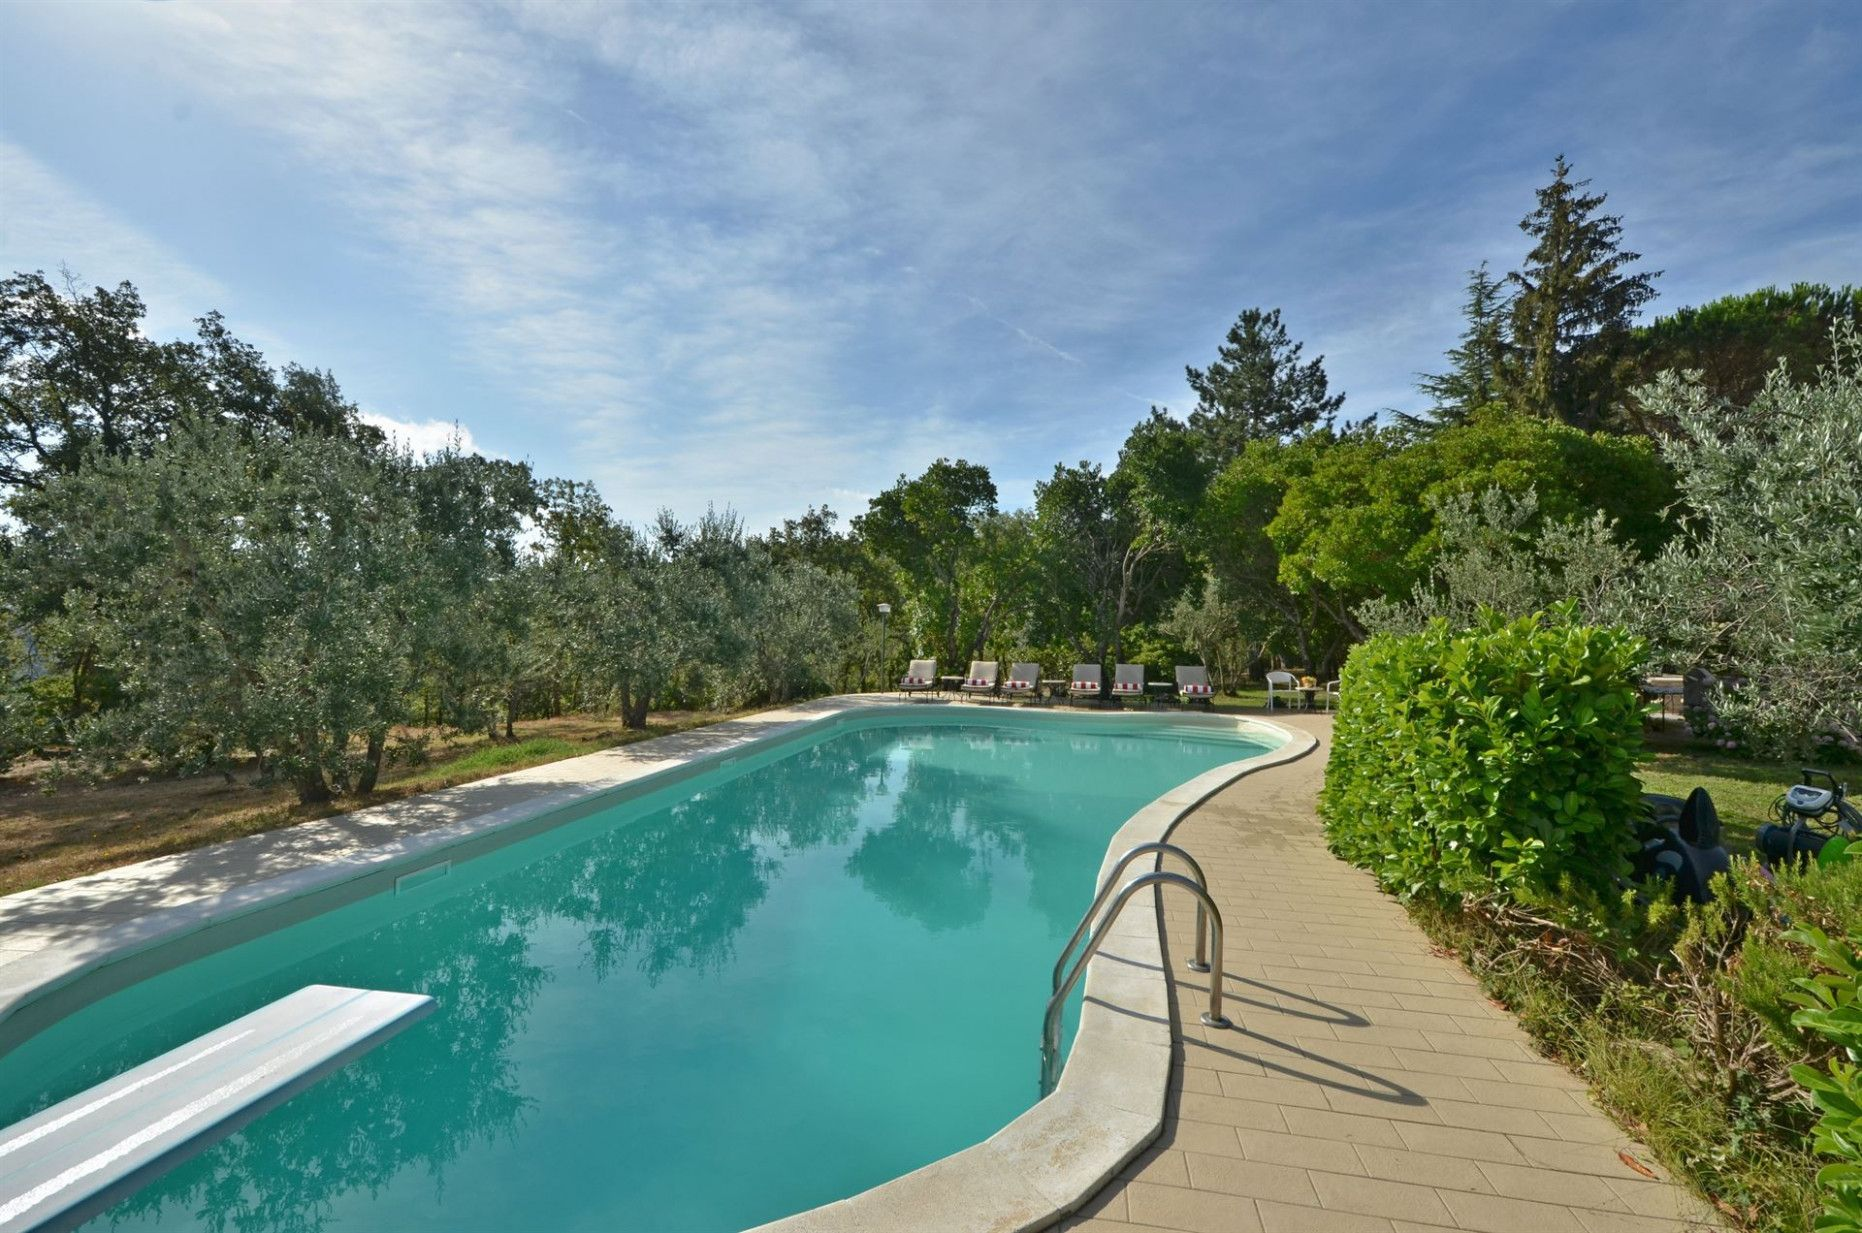 Table De Jardin Landi In 2020 Outdoor Outdoor Decor Pool